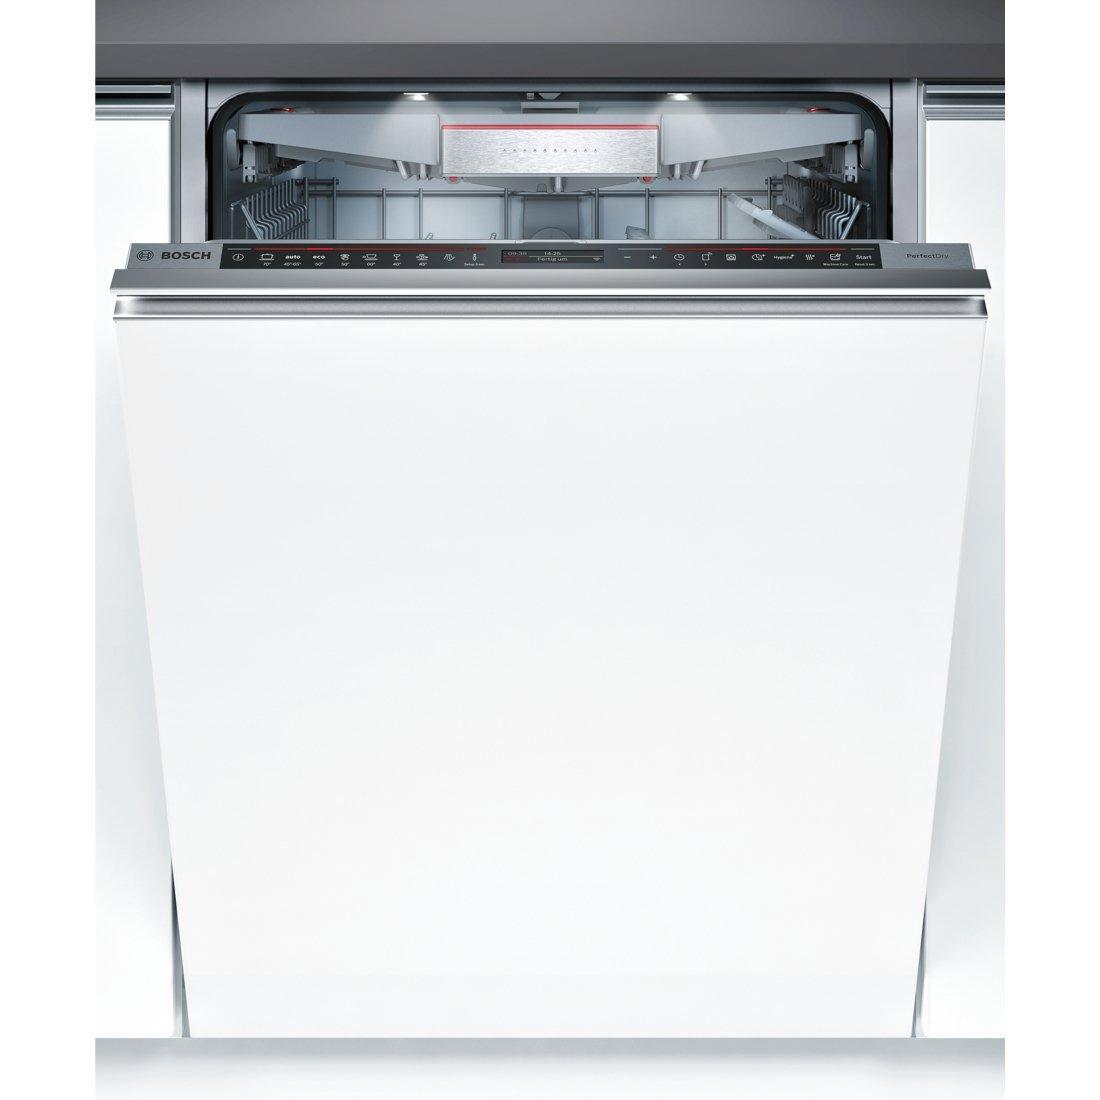 Bosch Dishwasher SBV88TX36E Built in, Width 60 cm, Number of place settings 13 Iebūvējamā Trauku mazgājamā mašīna